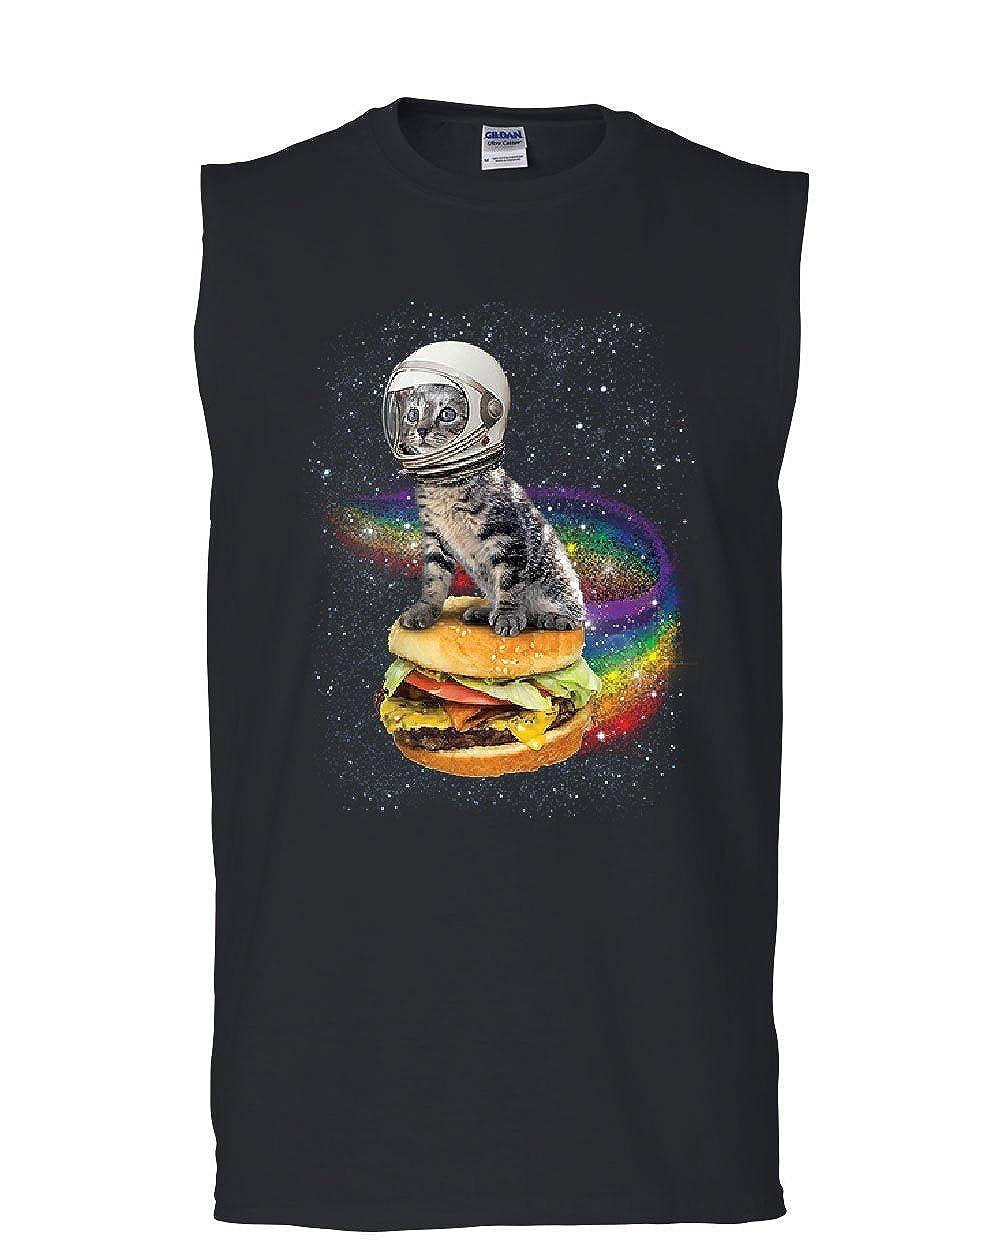 Cat Flying a Rainbow Burger Muscle Shirt Funny Astronaut Kitten Space Sleeveless